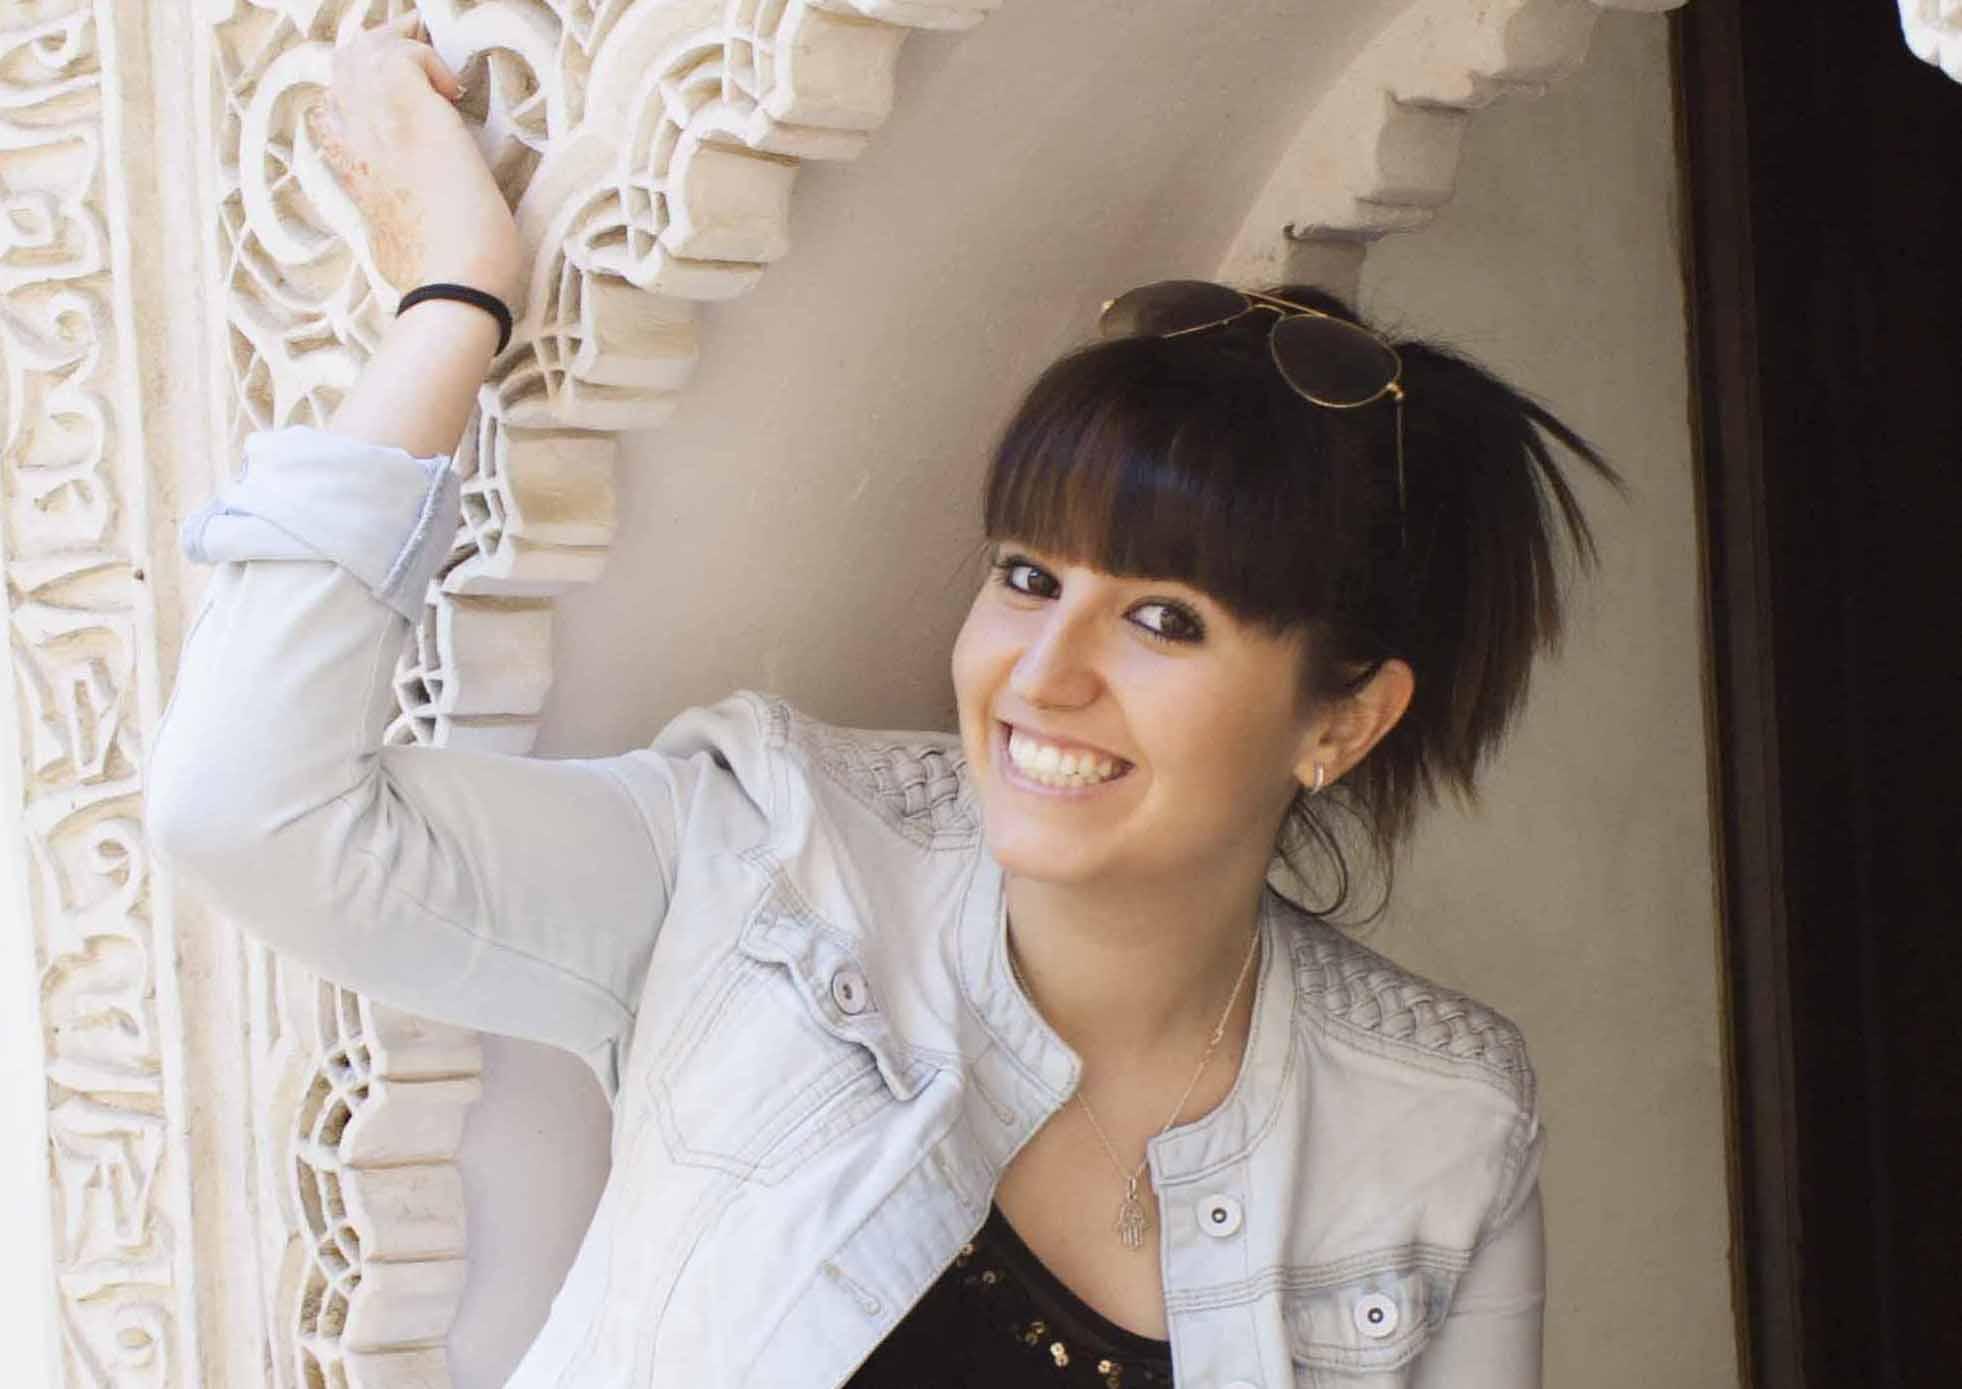 Paula De Frutos